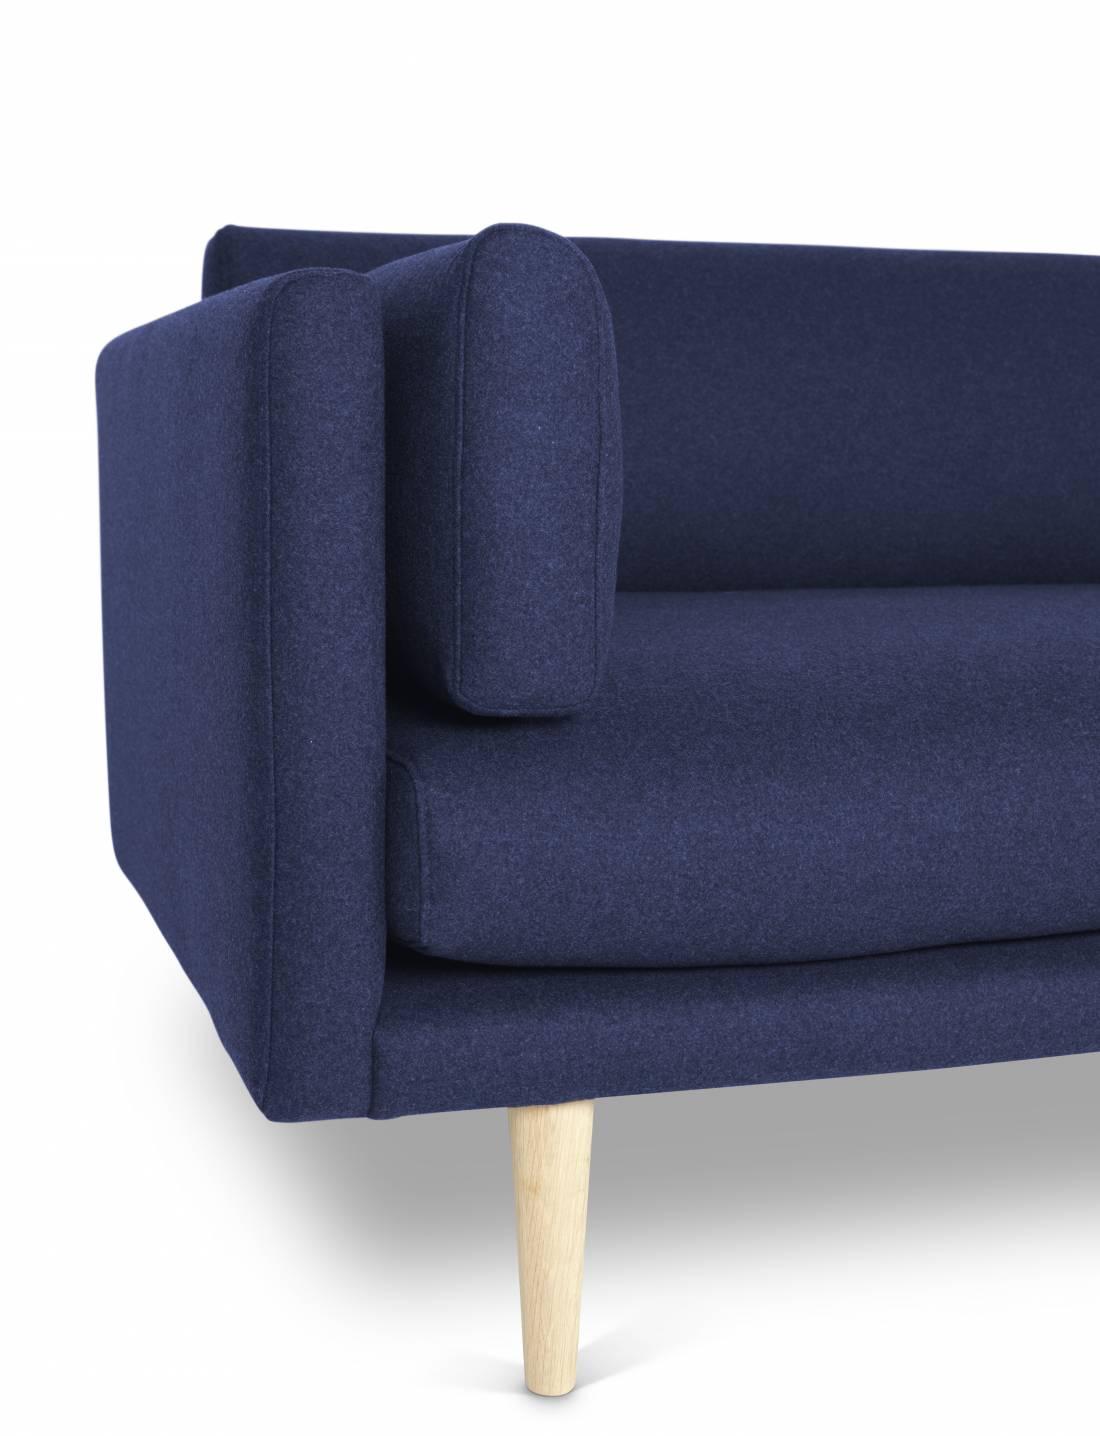 A-Sofa_-Sigurd-Larsen-for-Formal-A_Danish-design-berlin_Blue-Wool-corner-550x718@2x.jpg